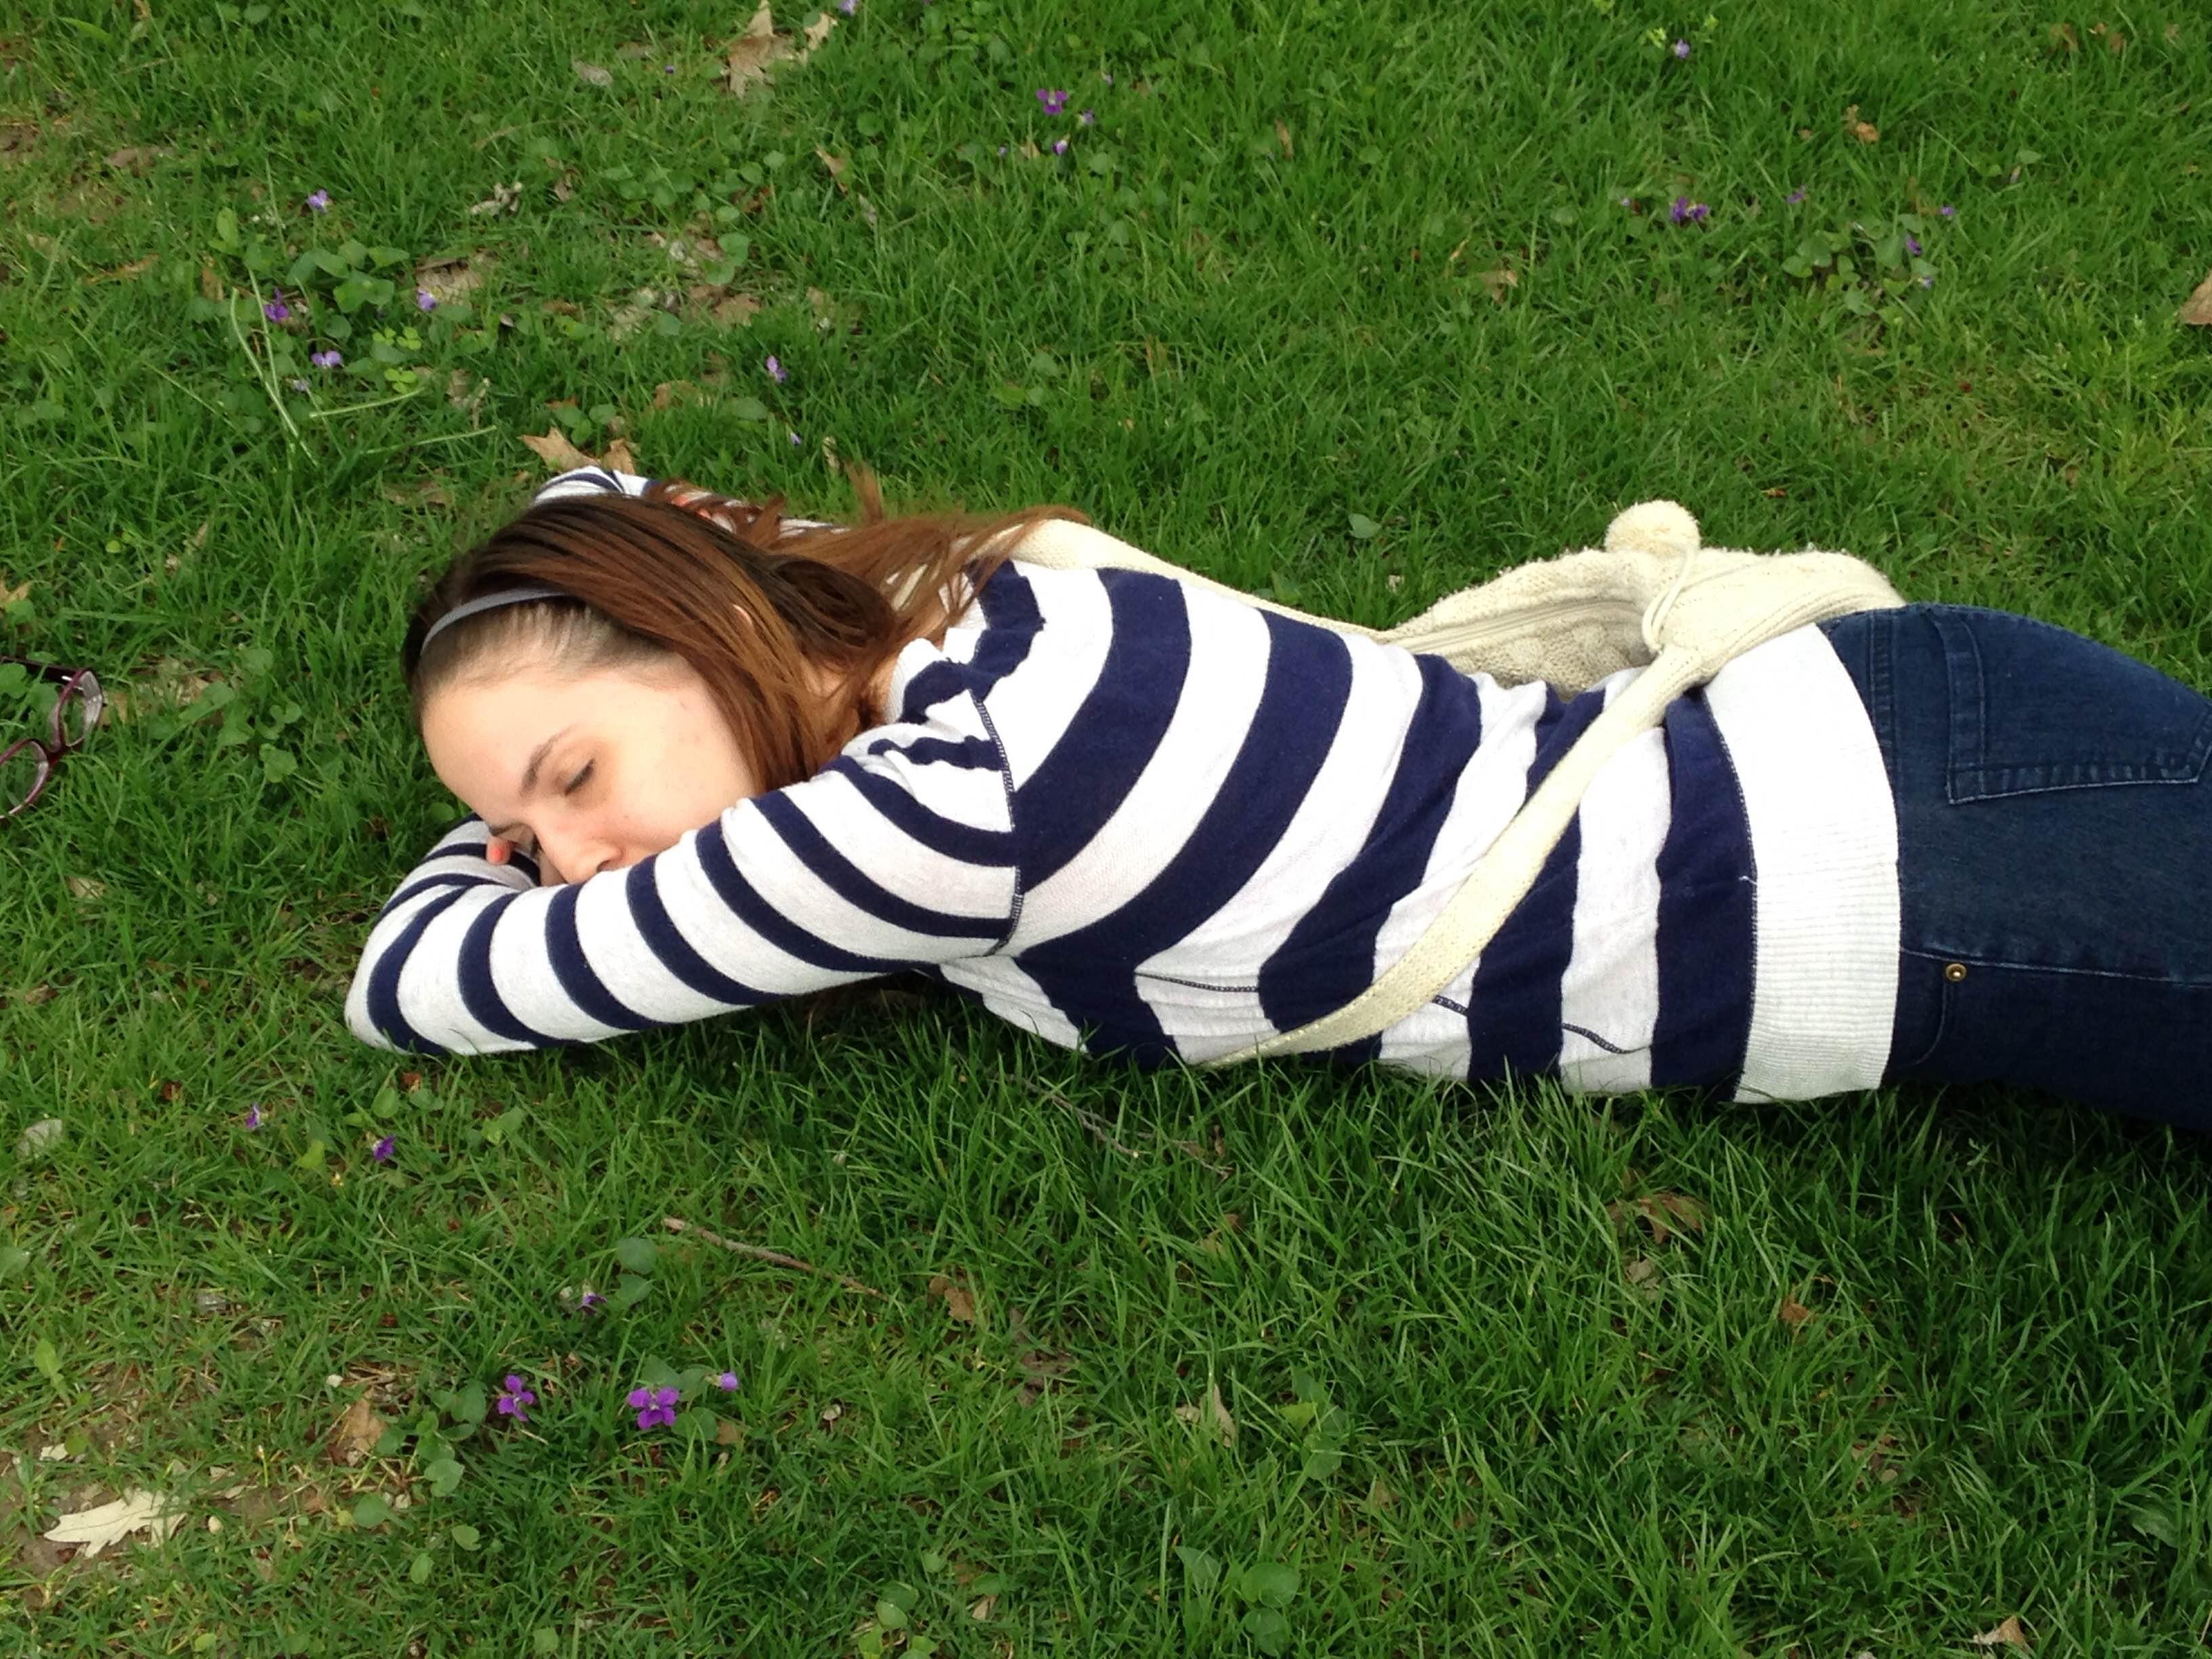 Sleeping Amanda